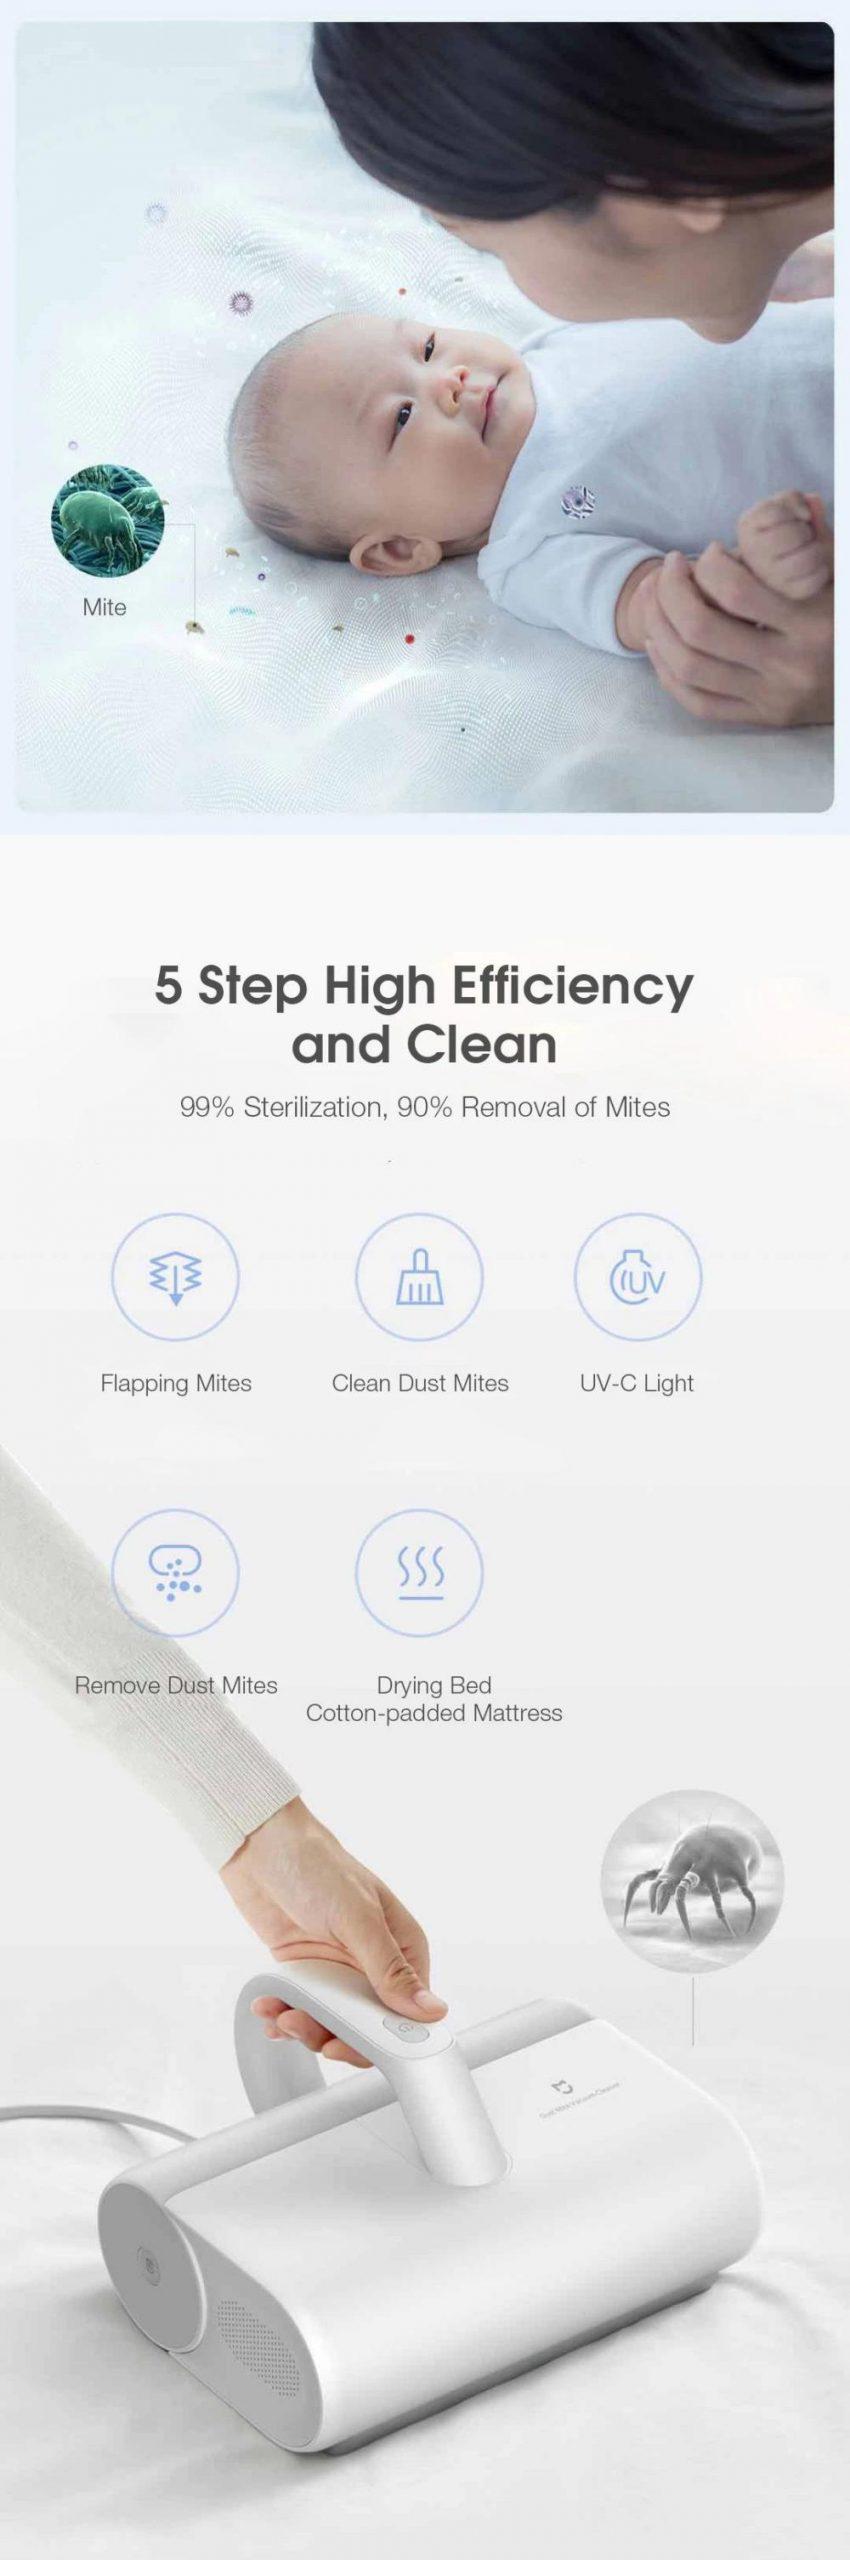 Mini Xiaomi Mijia Uv Sterilization Anti Mites Mattress Vacuum Cleaner 12000pa Strong Suction (5)